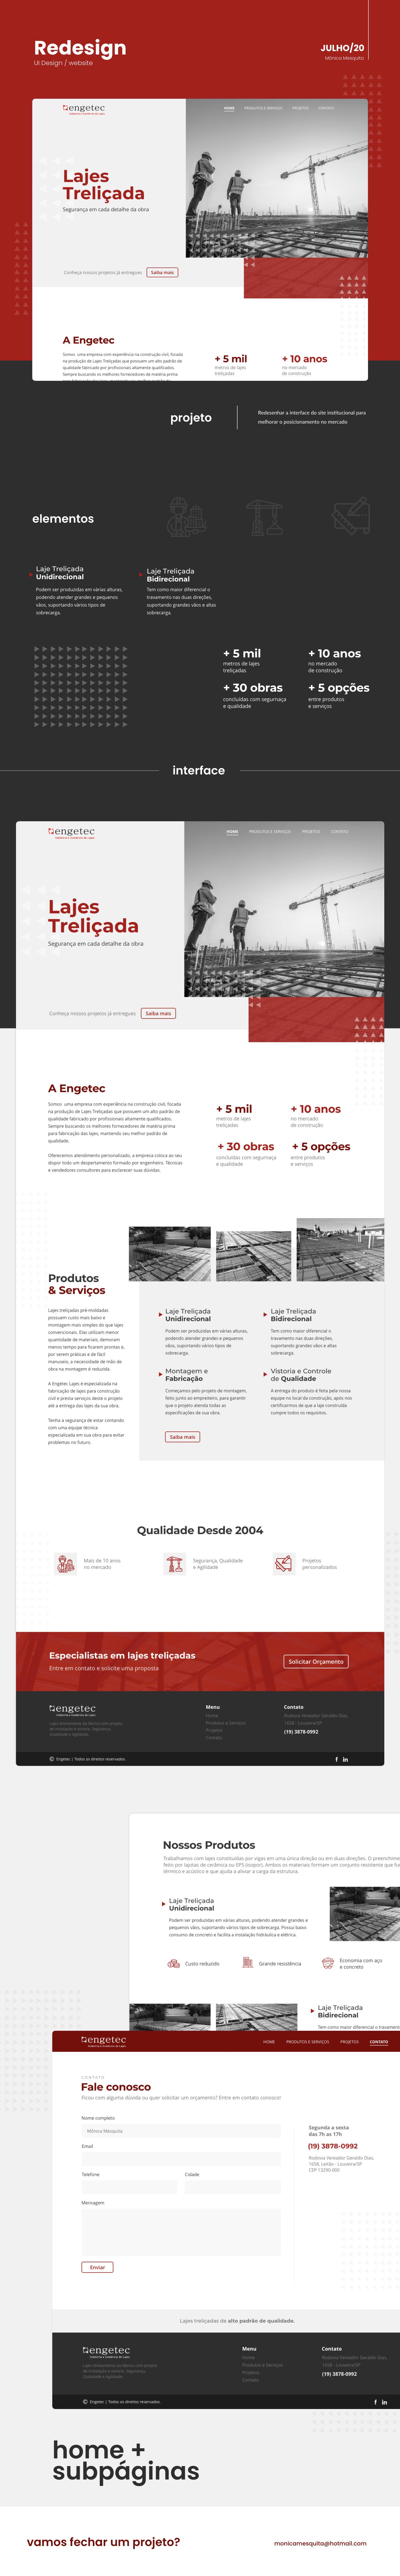 Interface uidesign Website